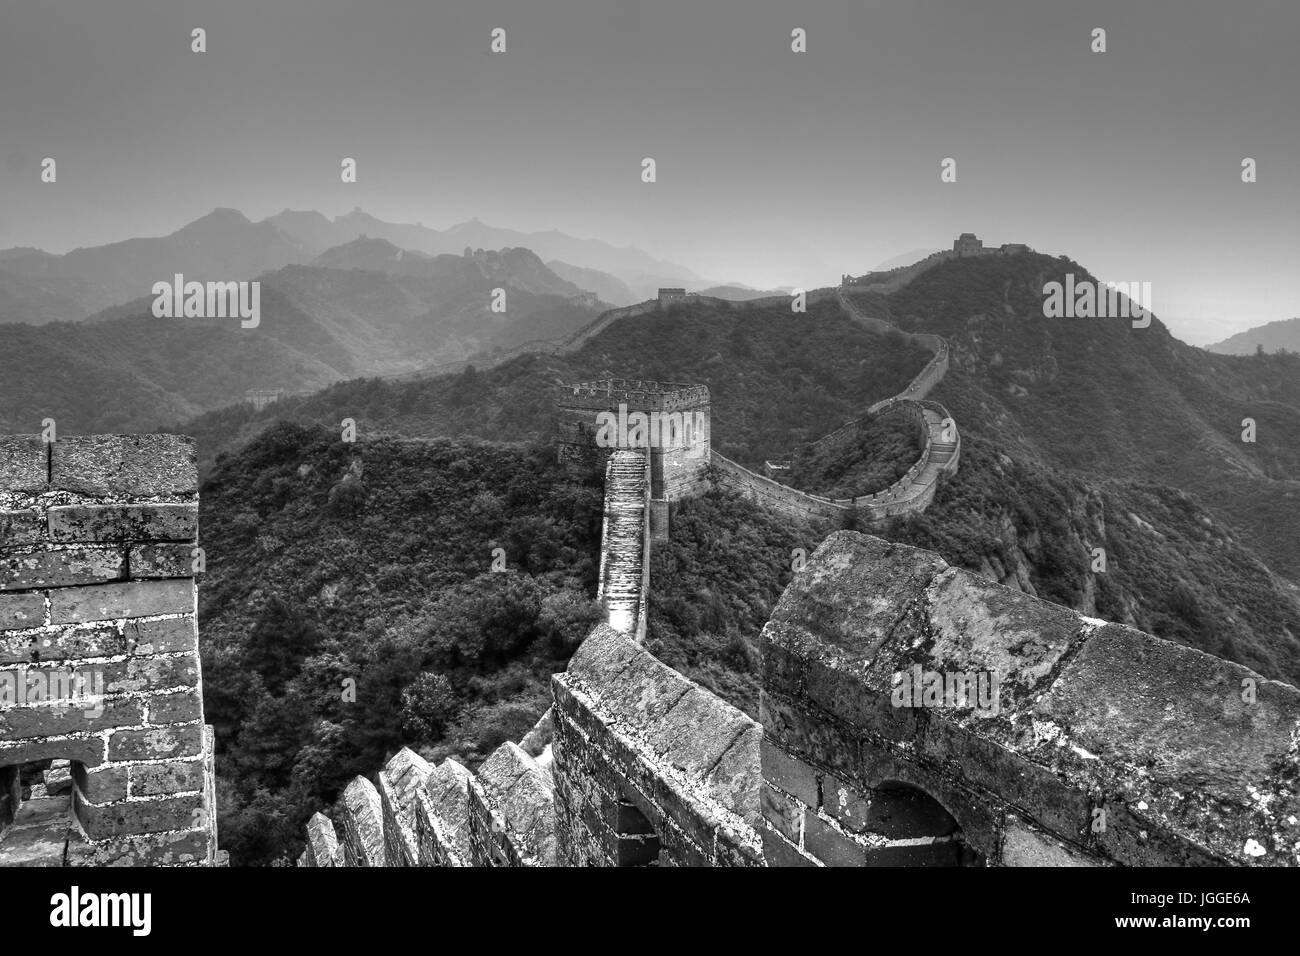 Gran Muralla china tour caminando Jinshanling Imagen De Stock